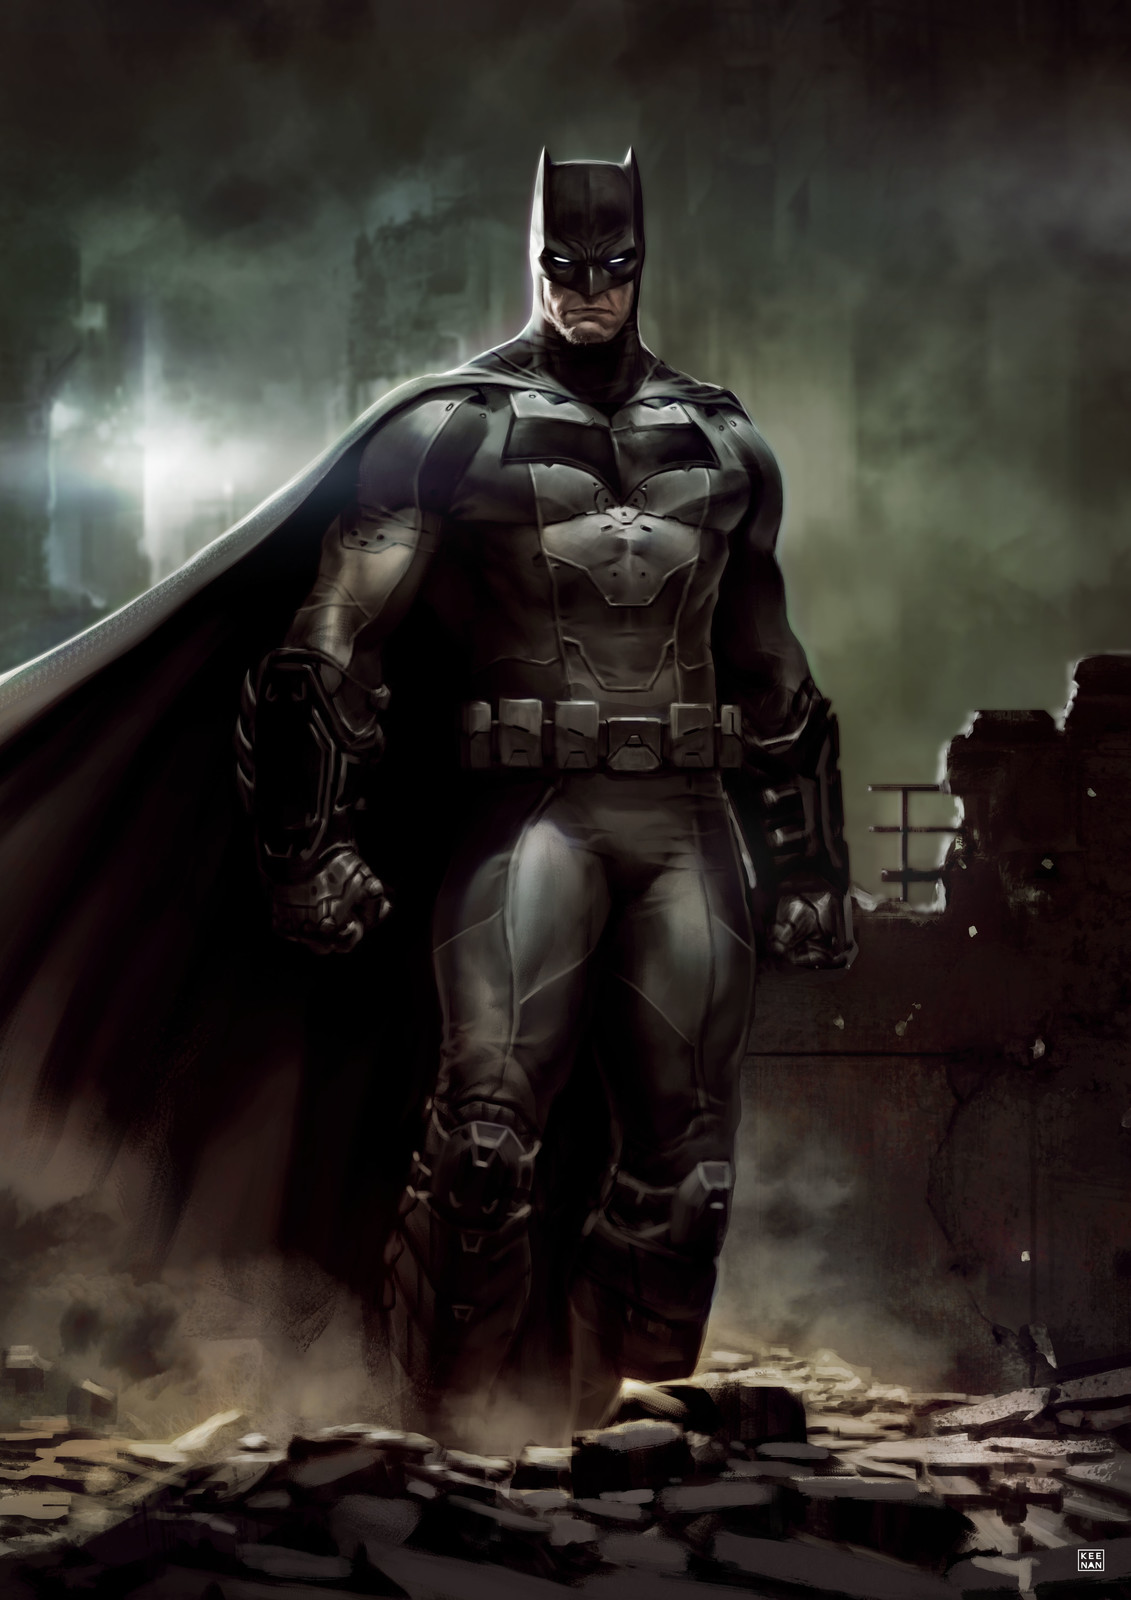 The Dark Knight: Gotham's Doom